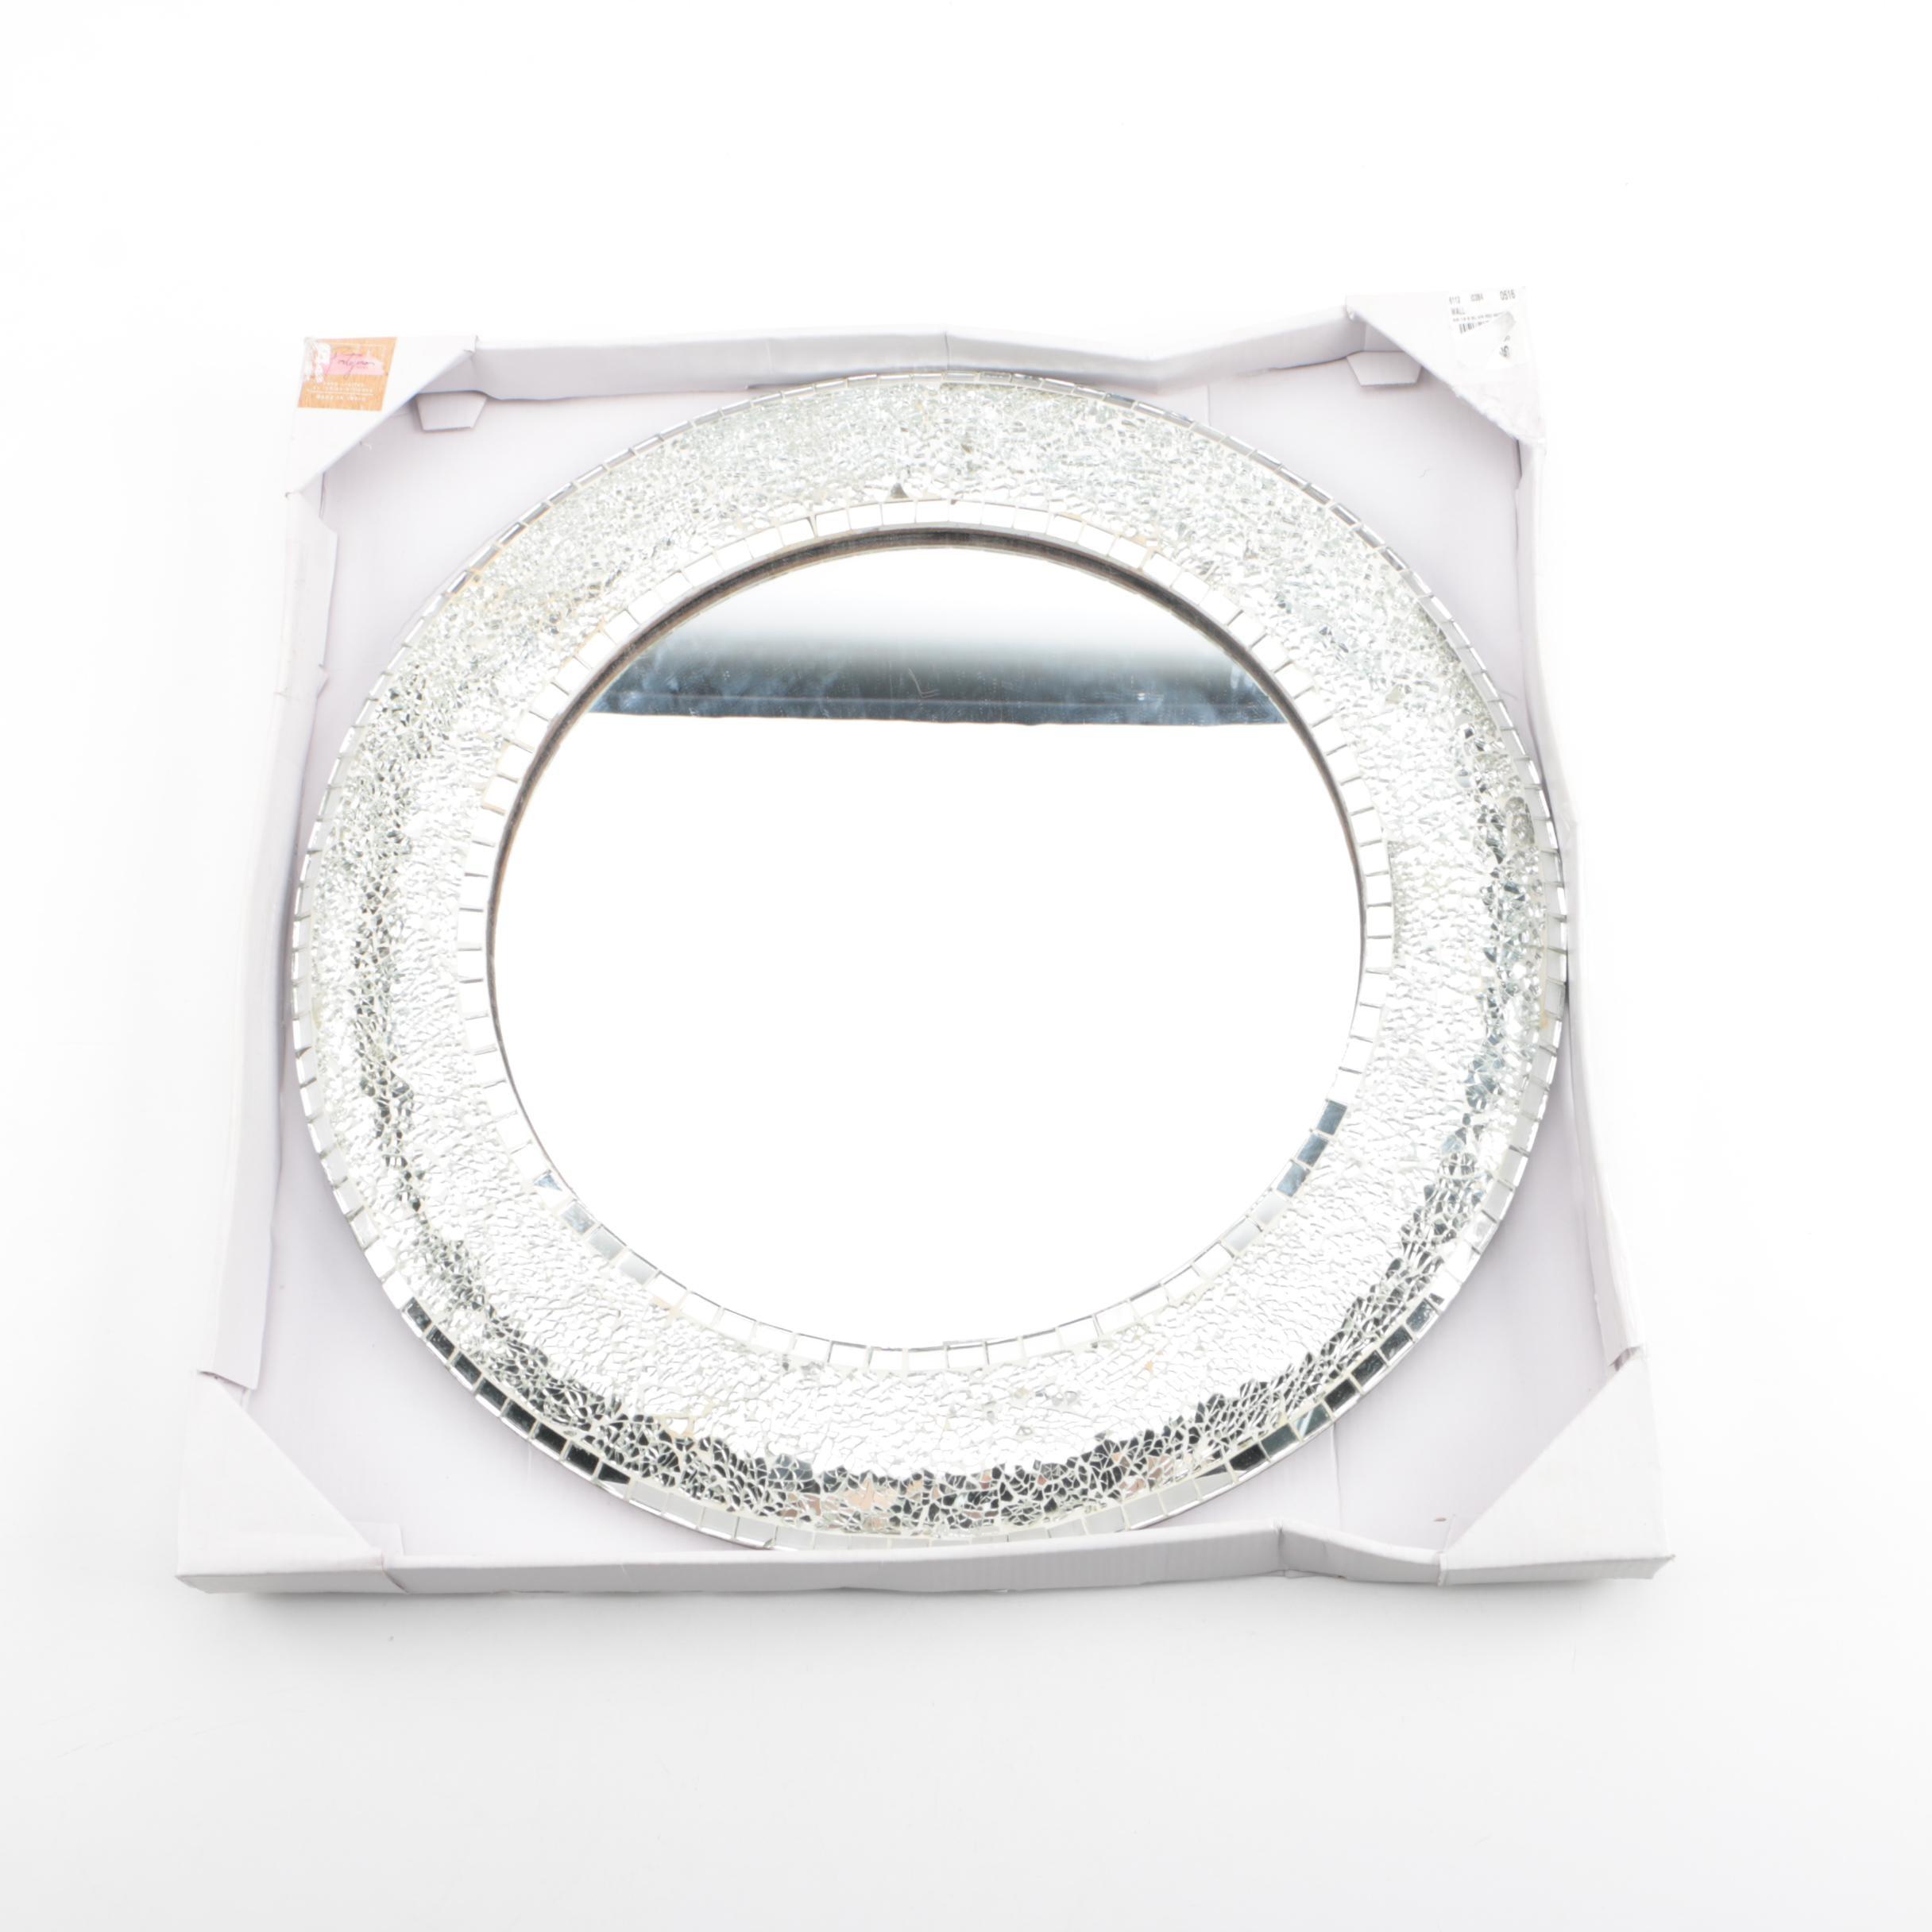 Portofino Handcrafted Round Mirror-Tiled Wall Mirror